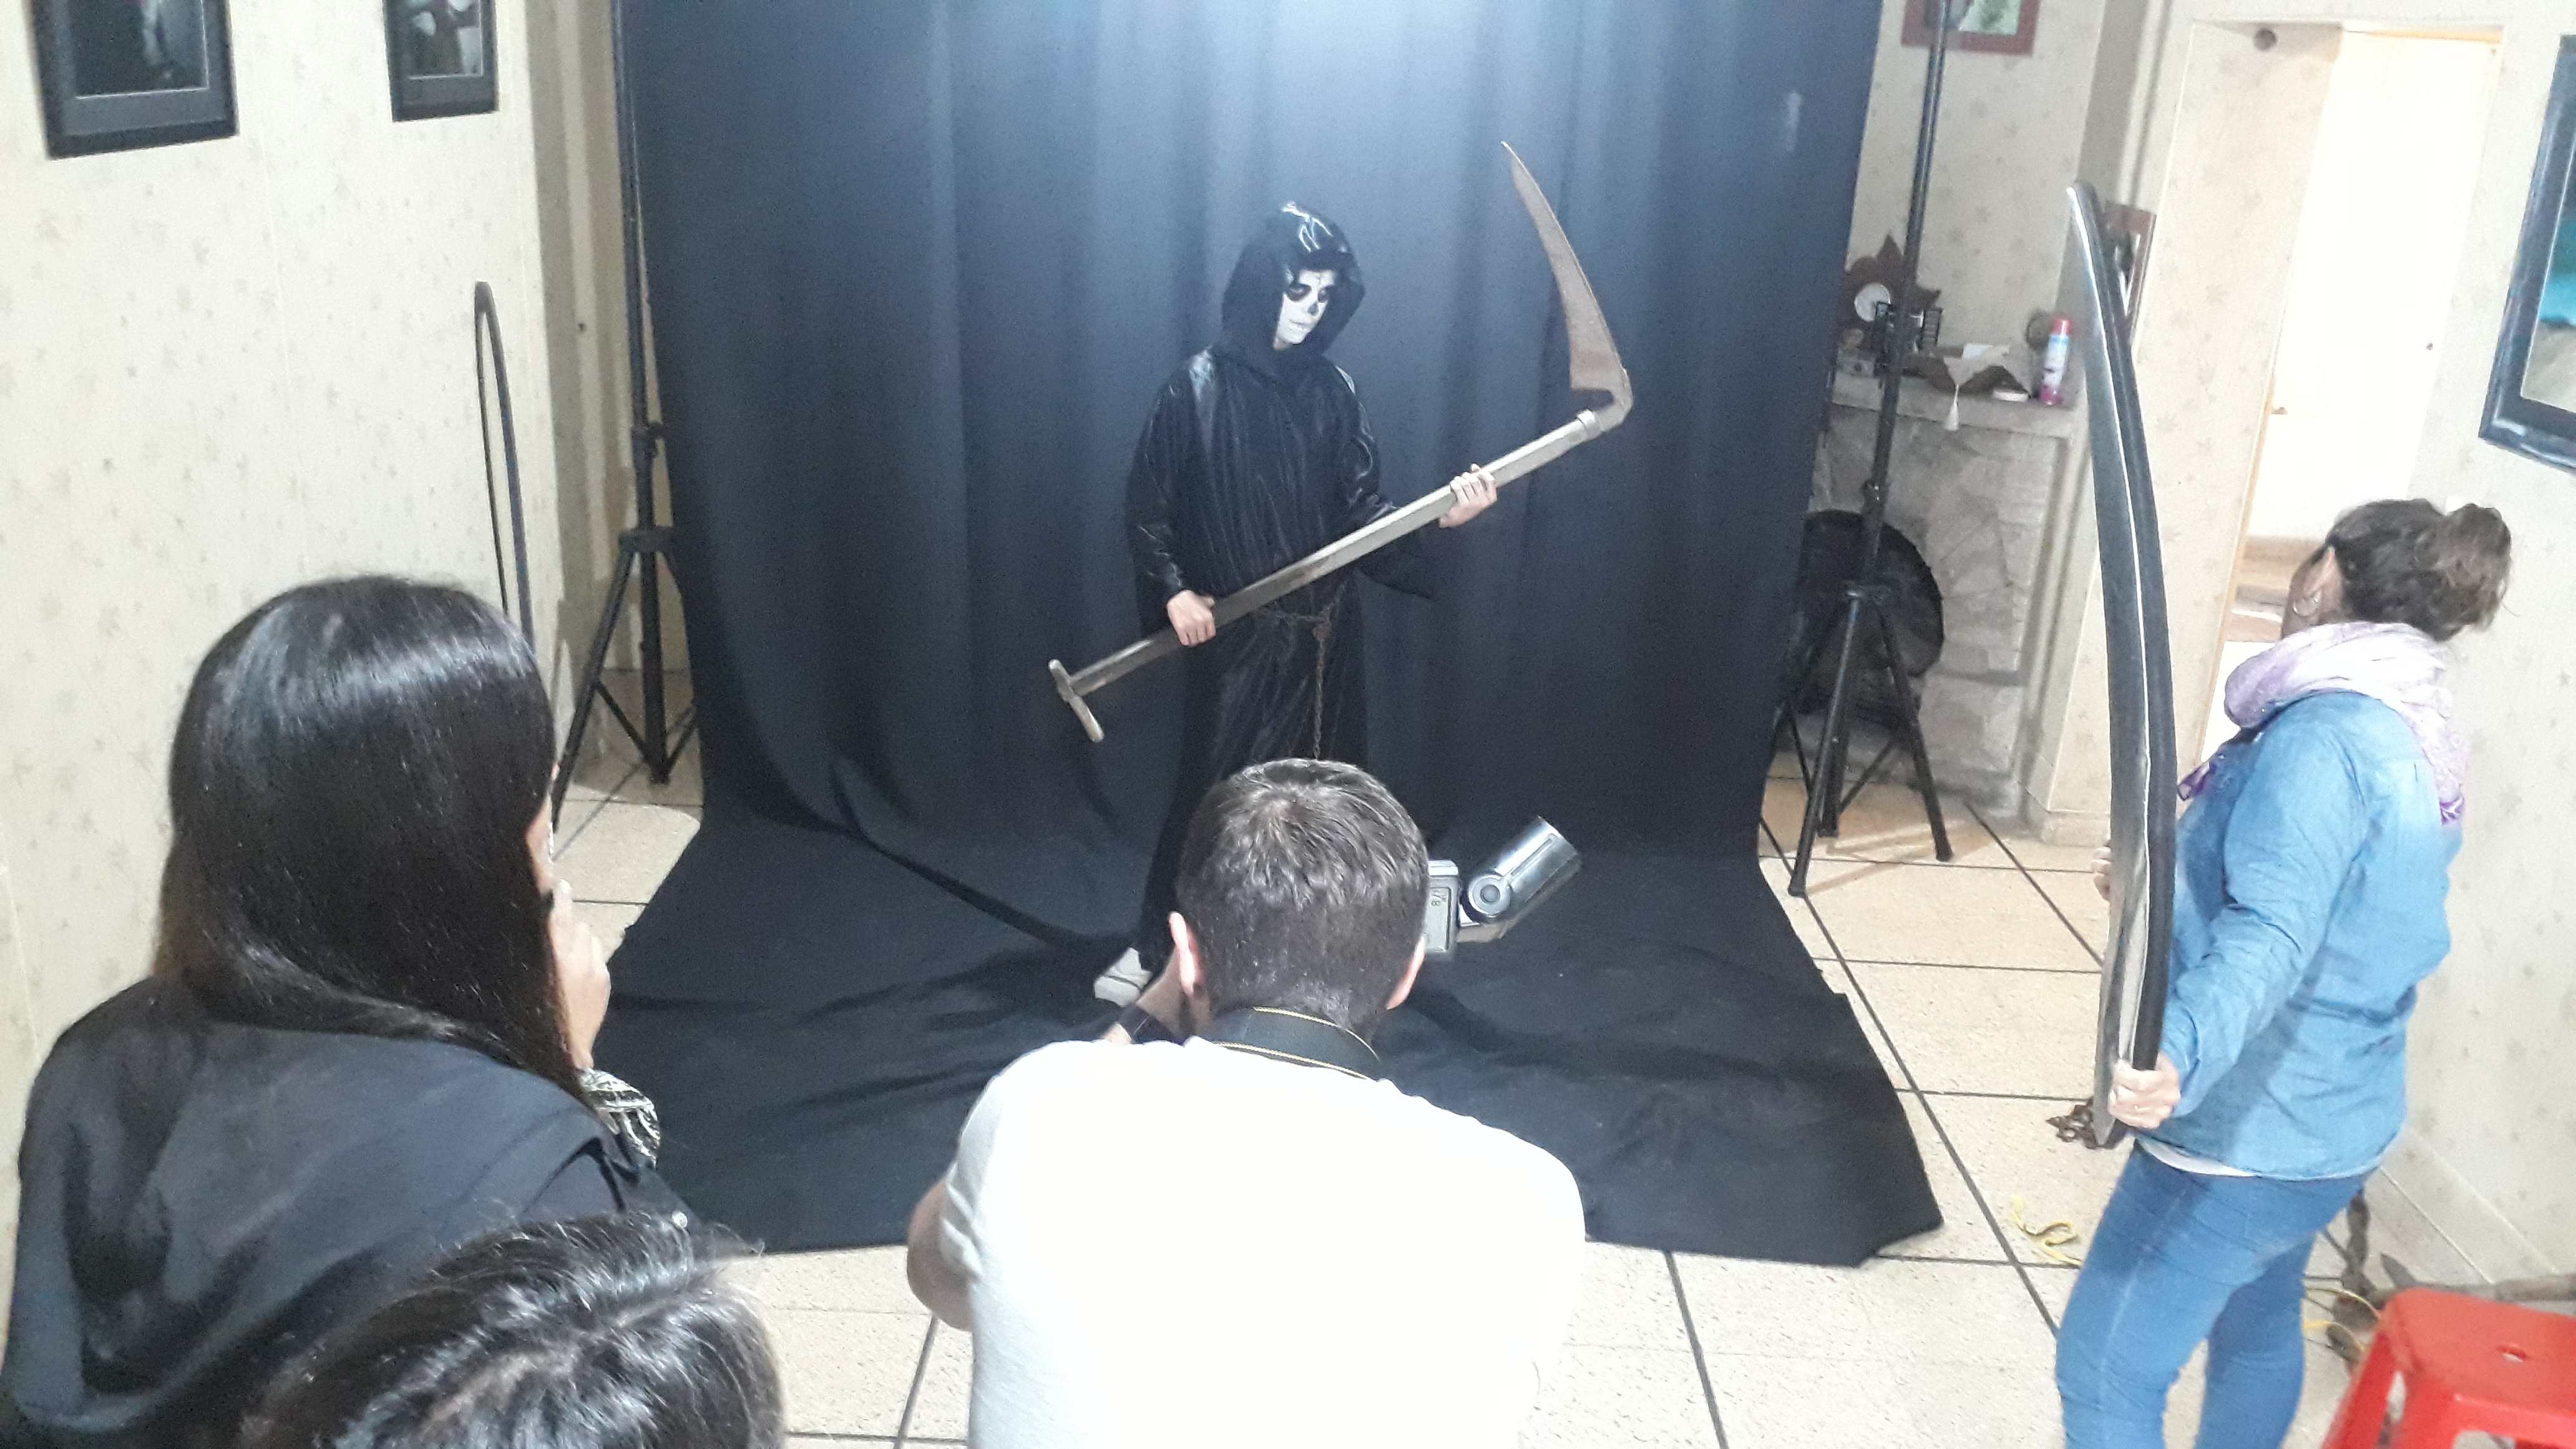 Backstage Produccion Fotografica